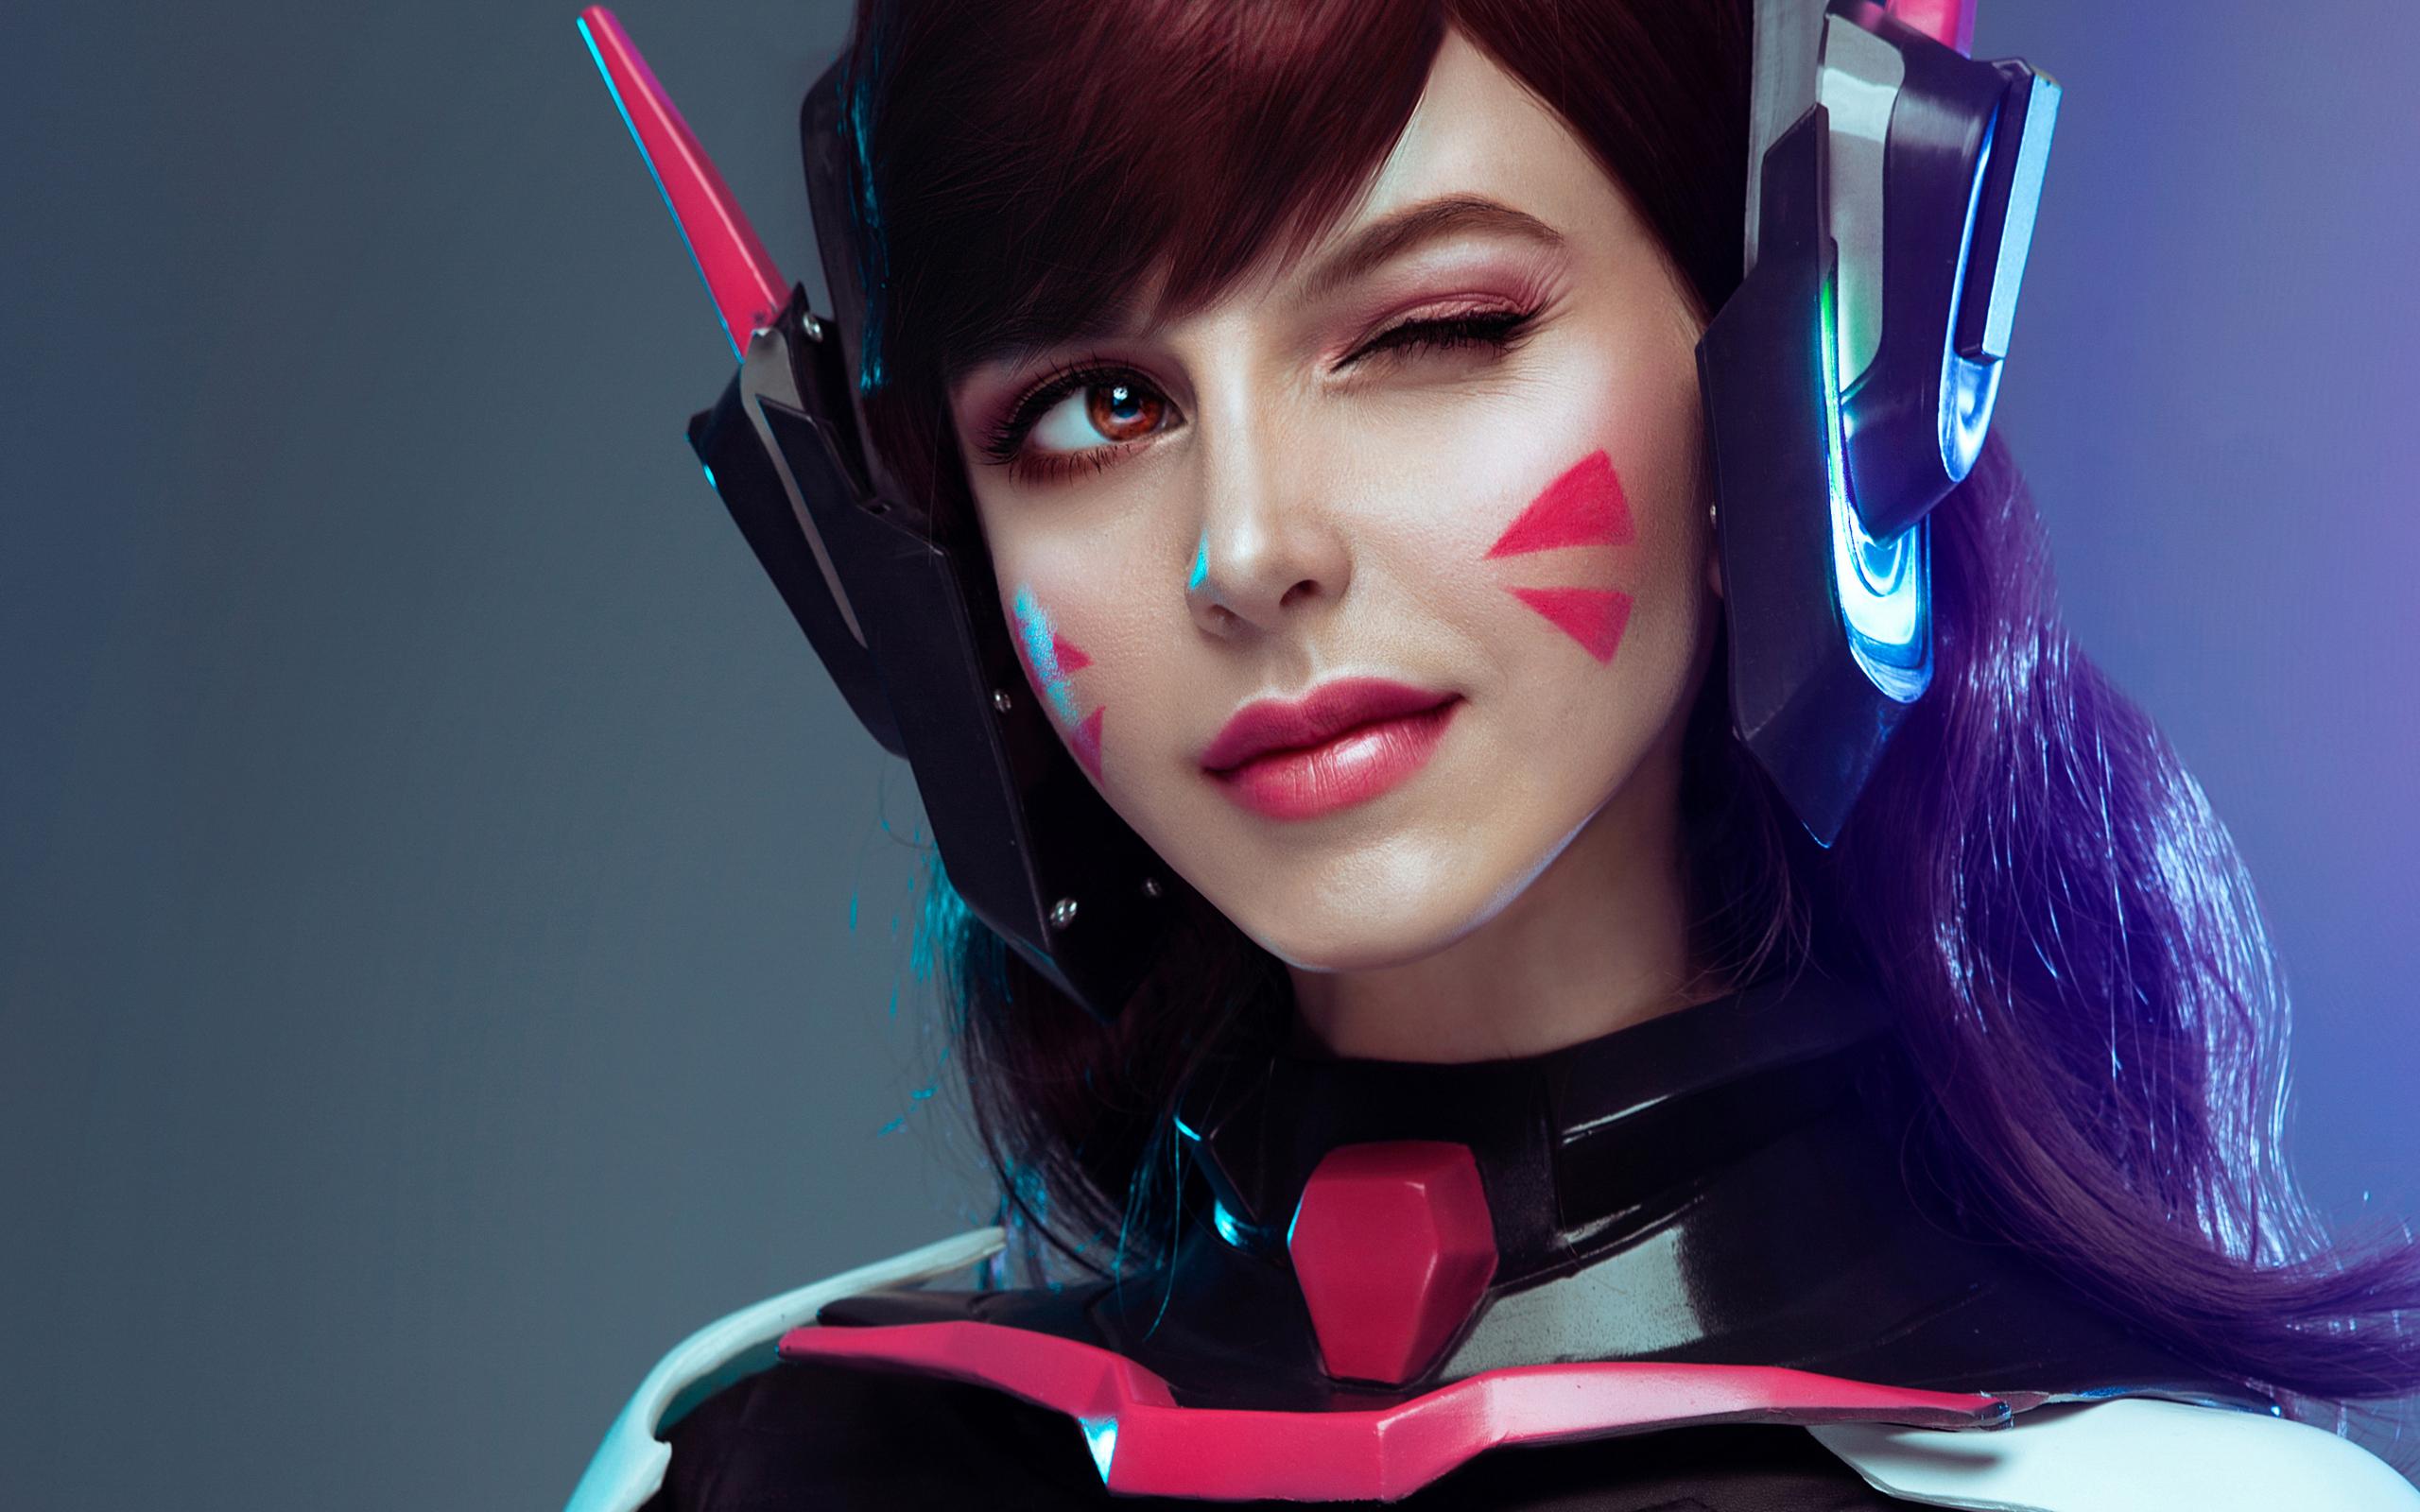 dva-from-overwatch-cosplay-ot.jpg